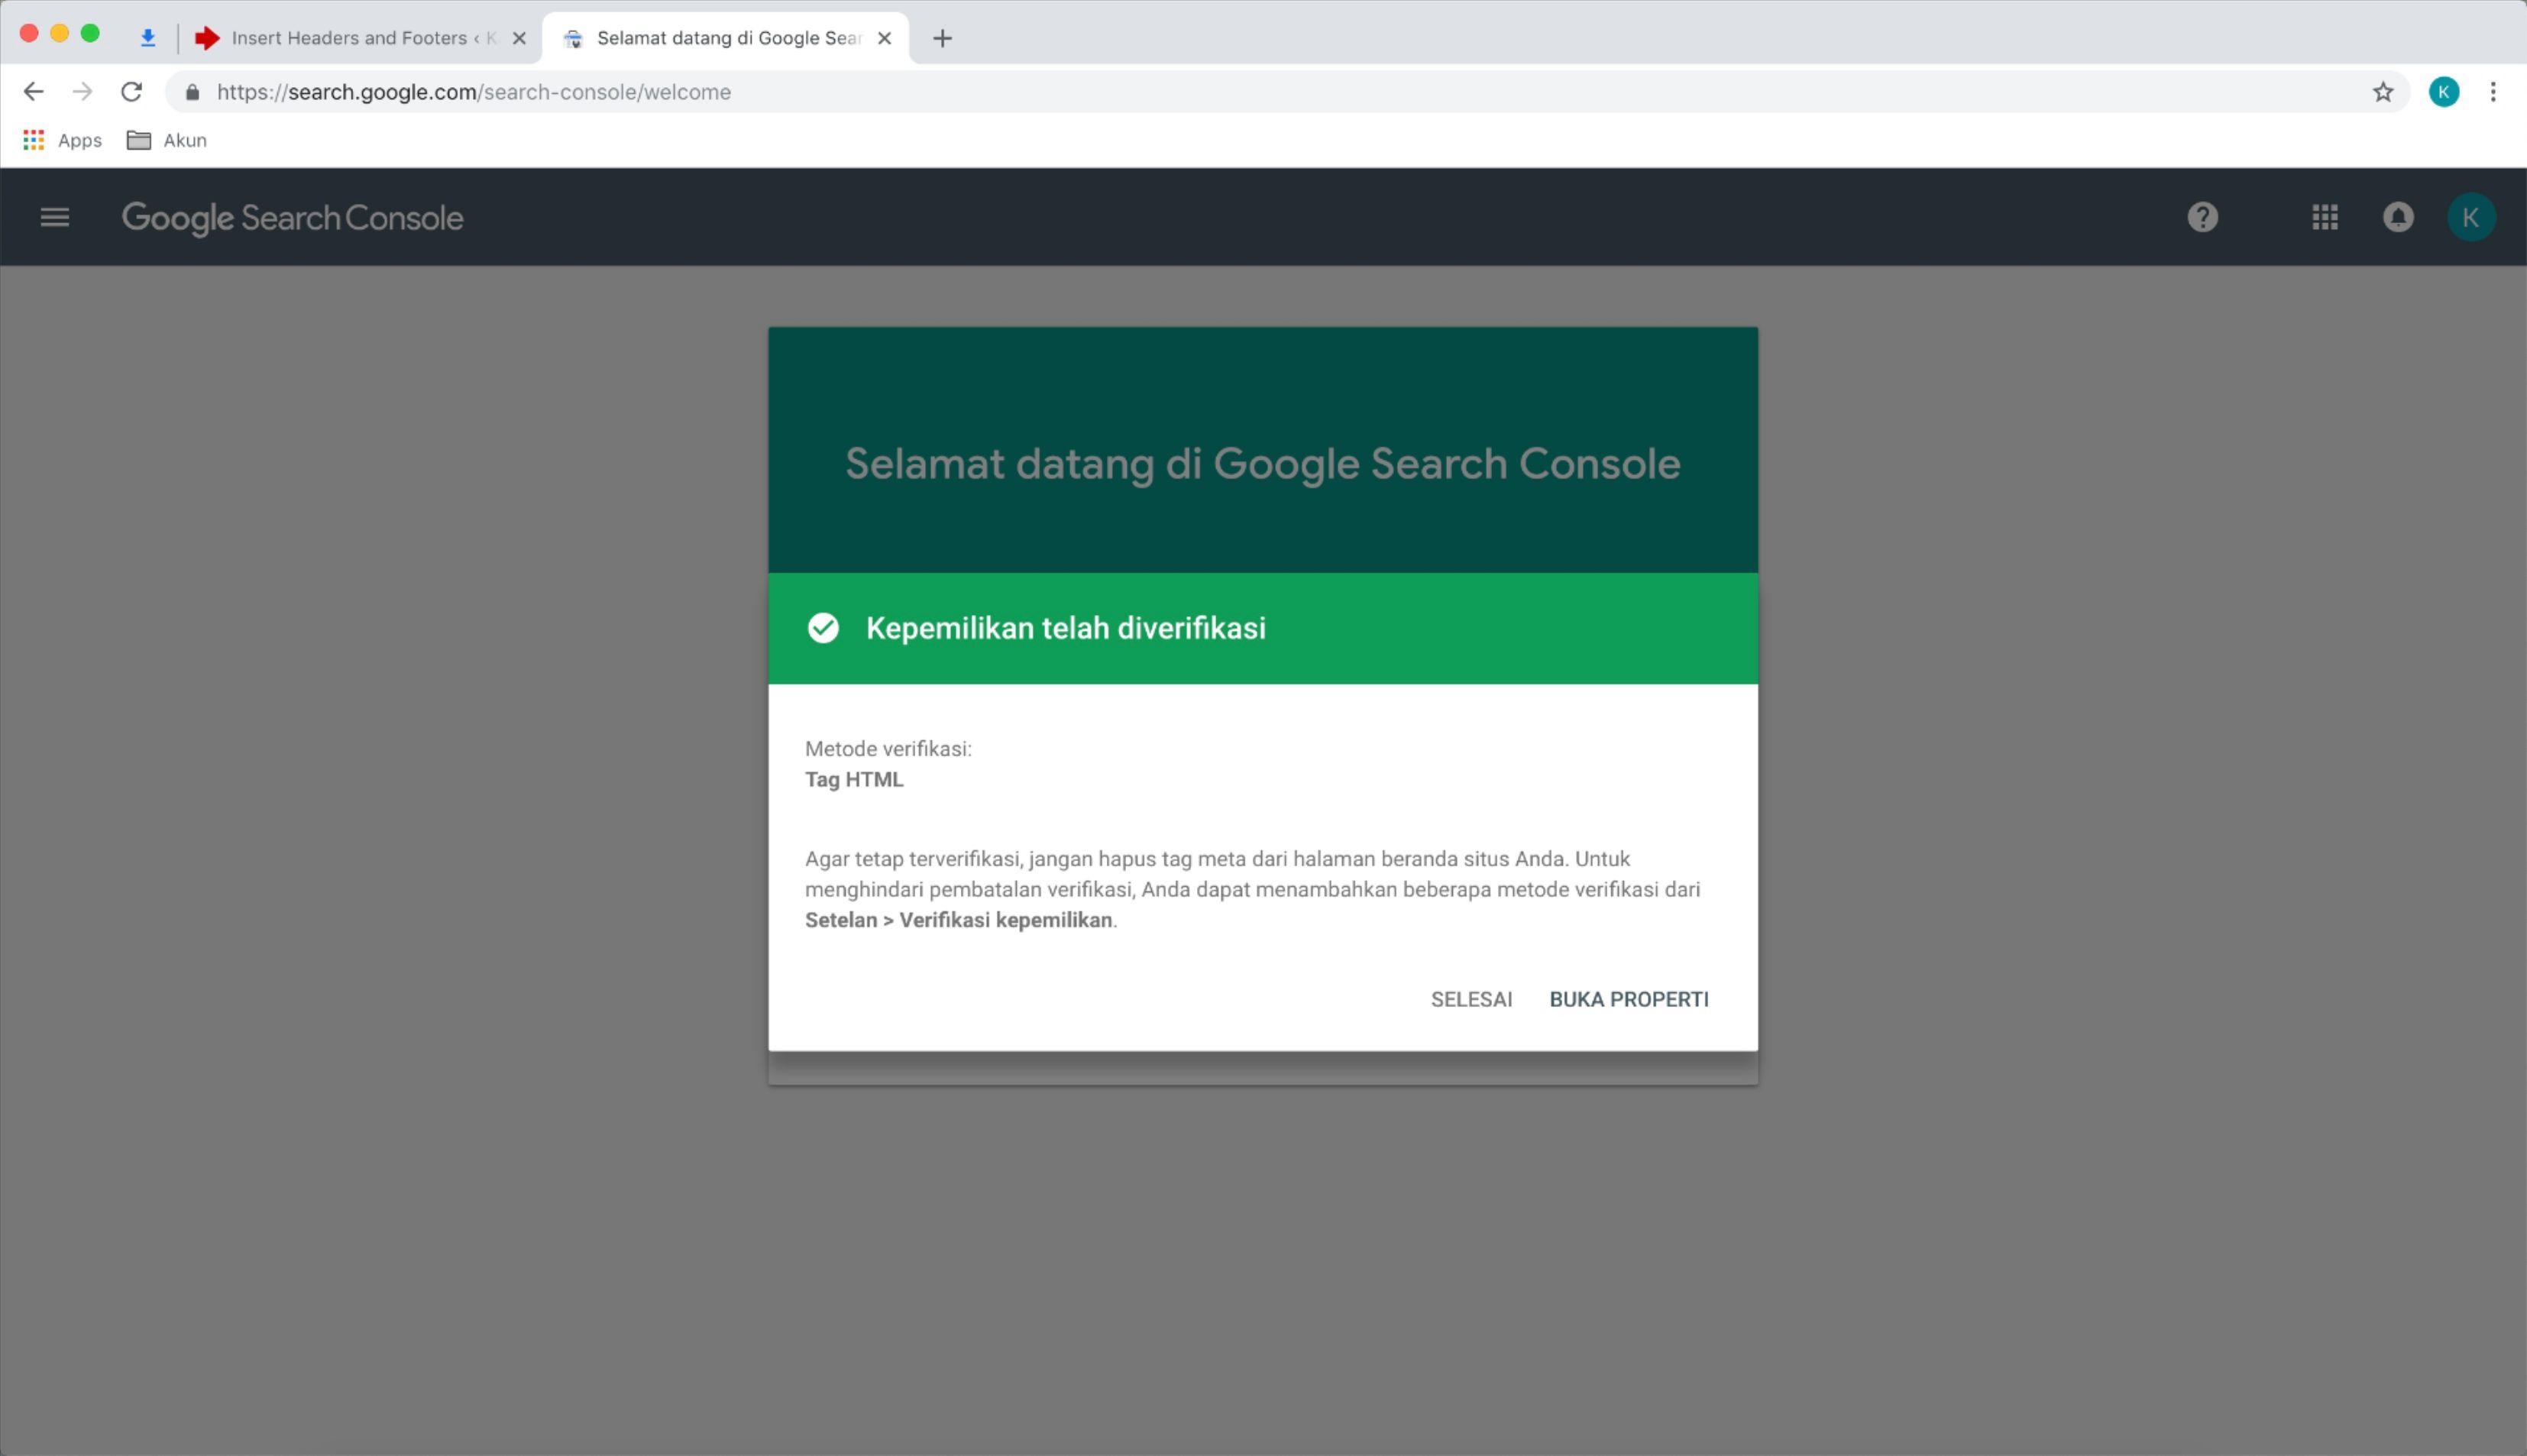 verifikasi google search console berhasil